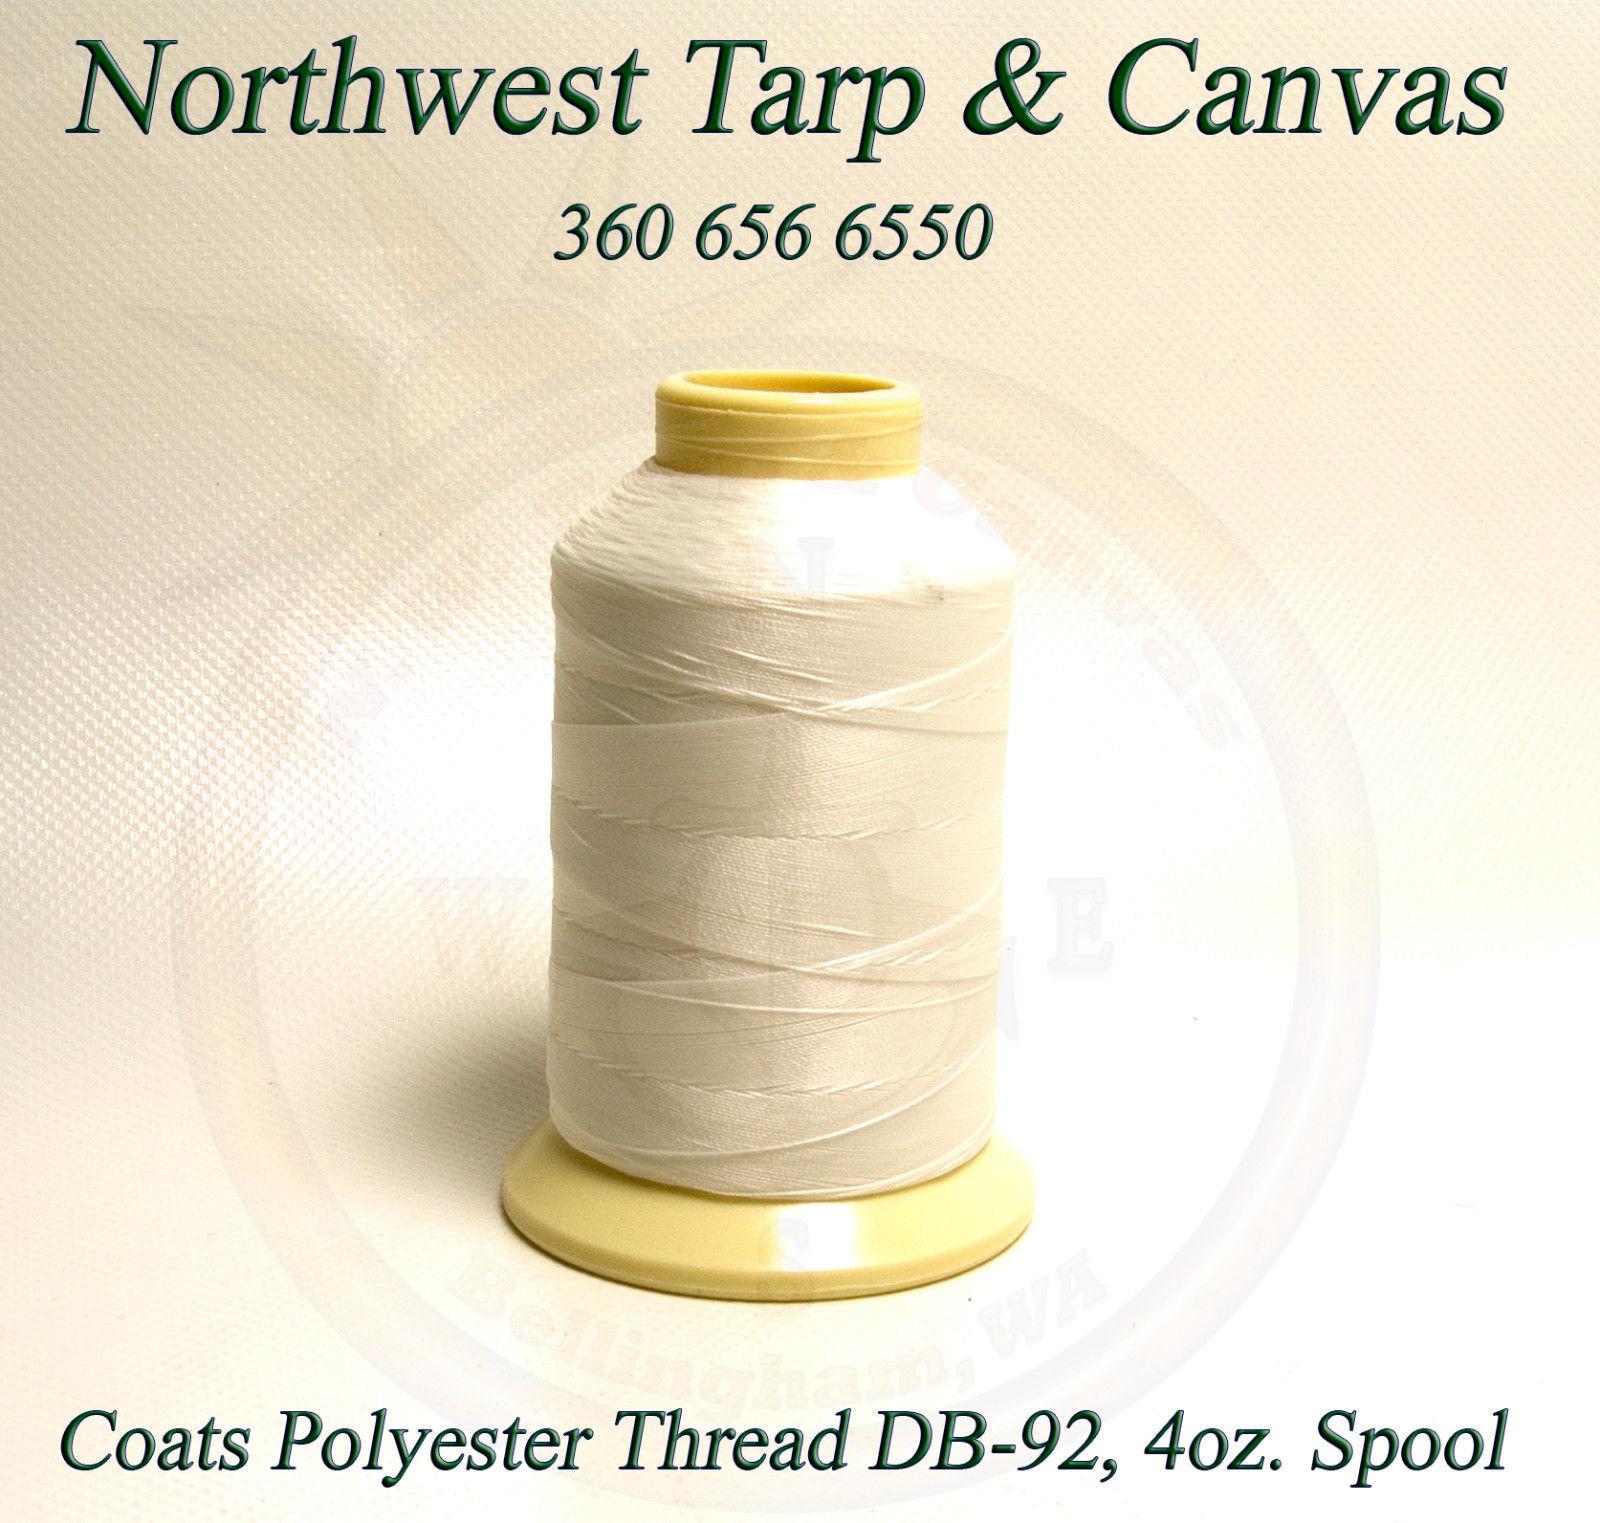 Thread, Polyester, Coats Bonded, Thread-4 oz. Spool, White, Size DB-92 T-90